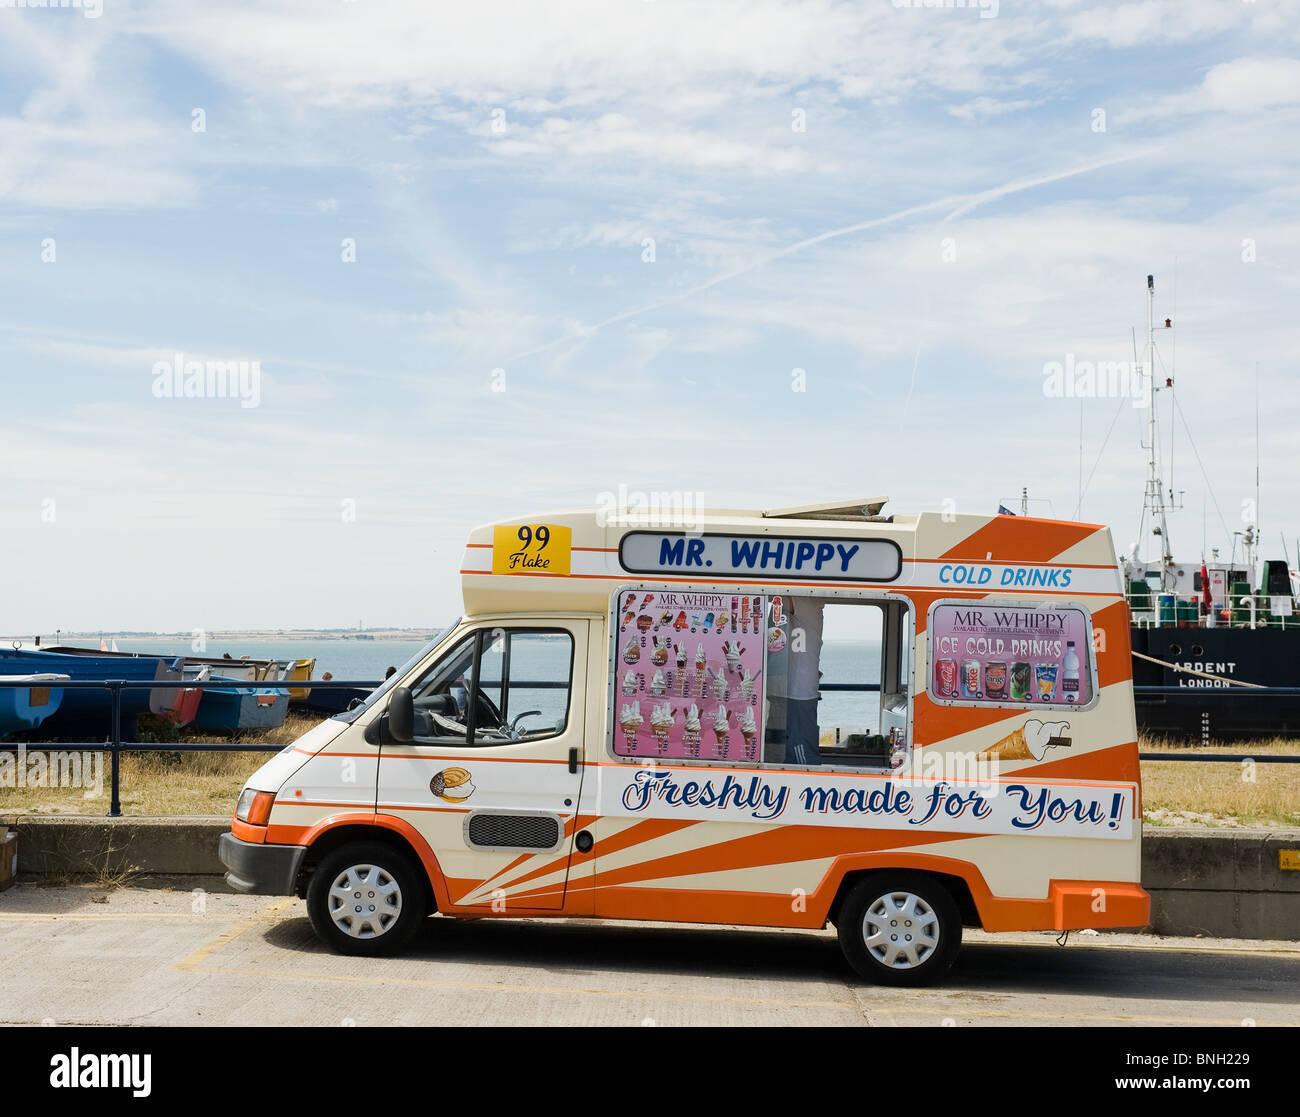 9c5b923d52 Mr Whippy Ice Cream Van Stock Photos   Mr Whippy Ice Cream Van Stock ...